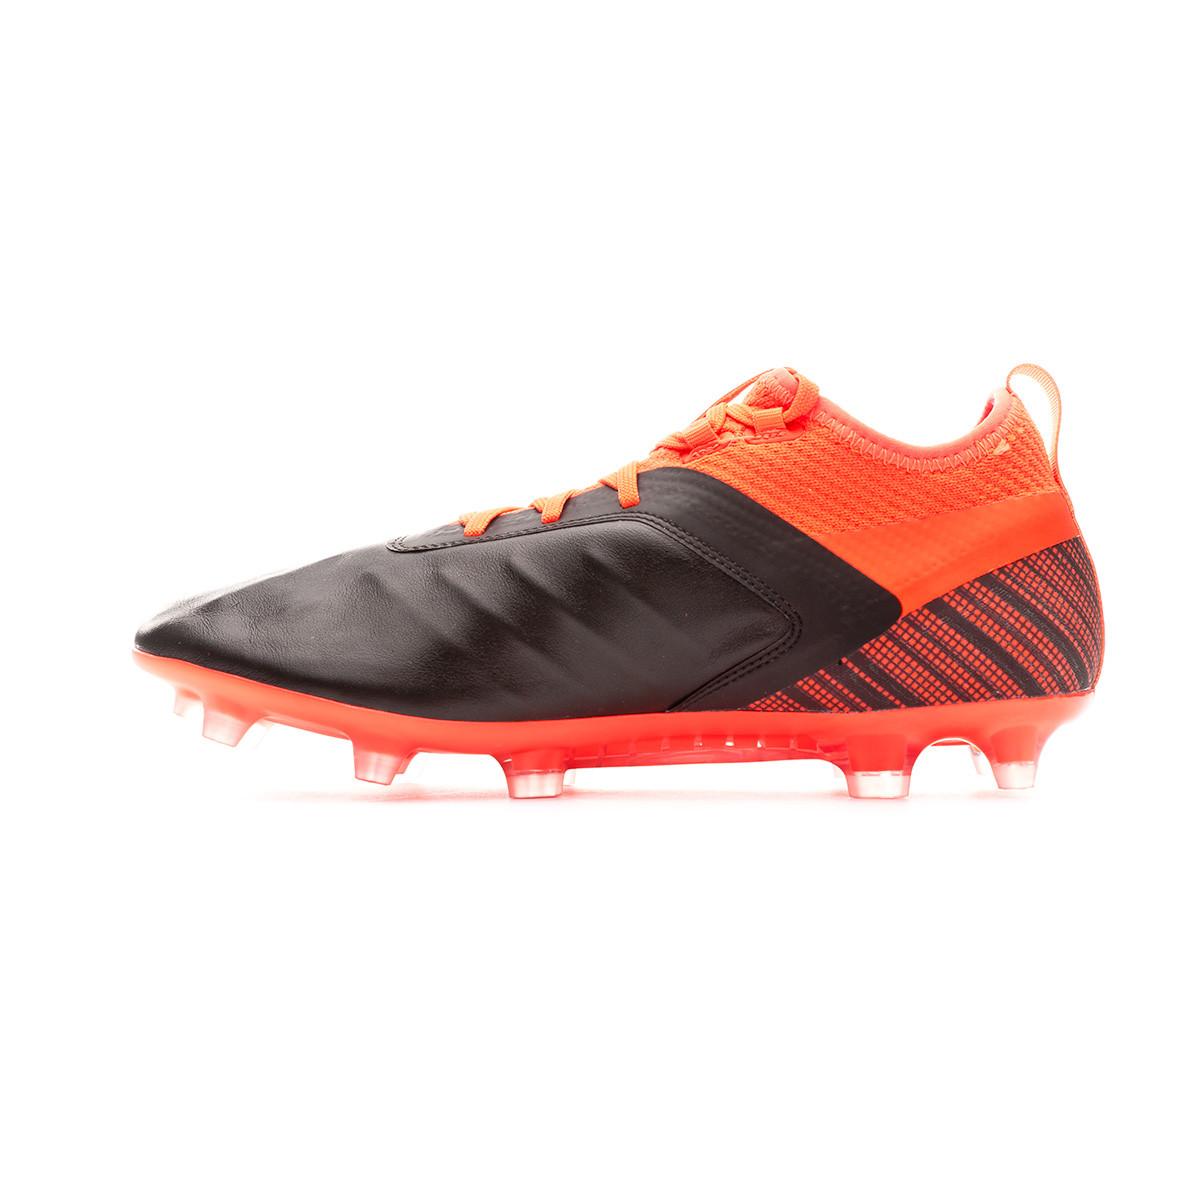 Football Boots Puma One 5.2 FG/AG Puma